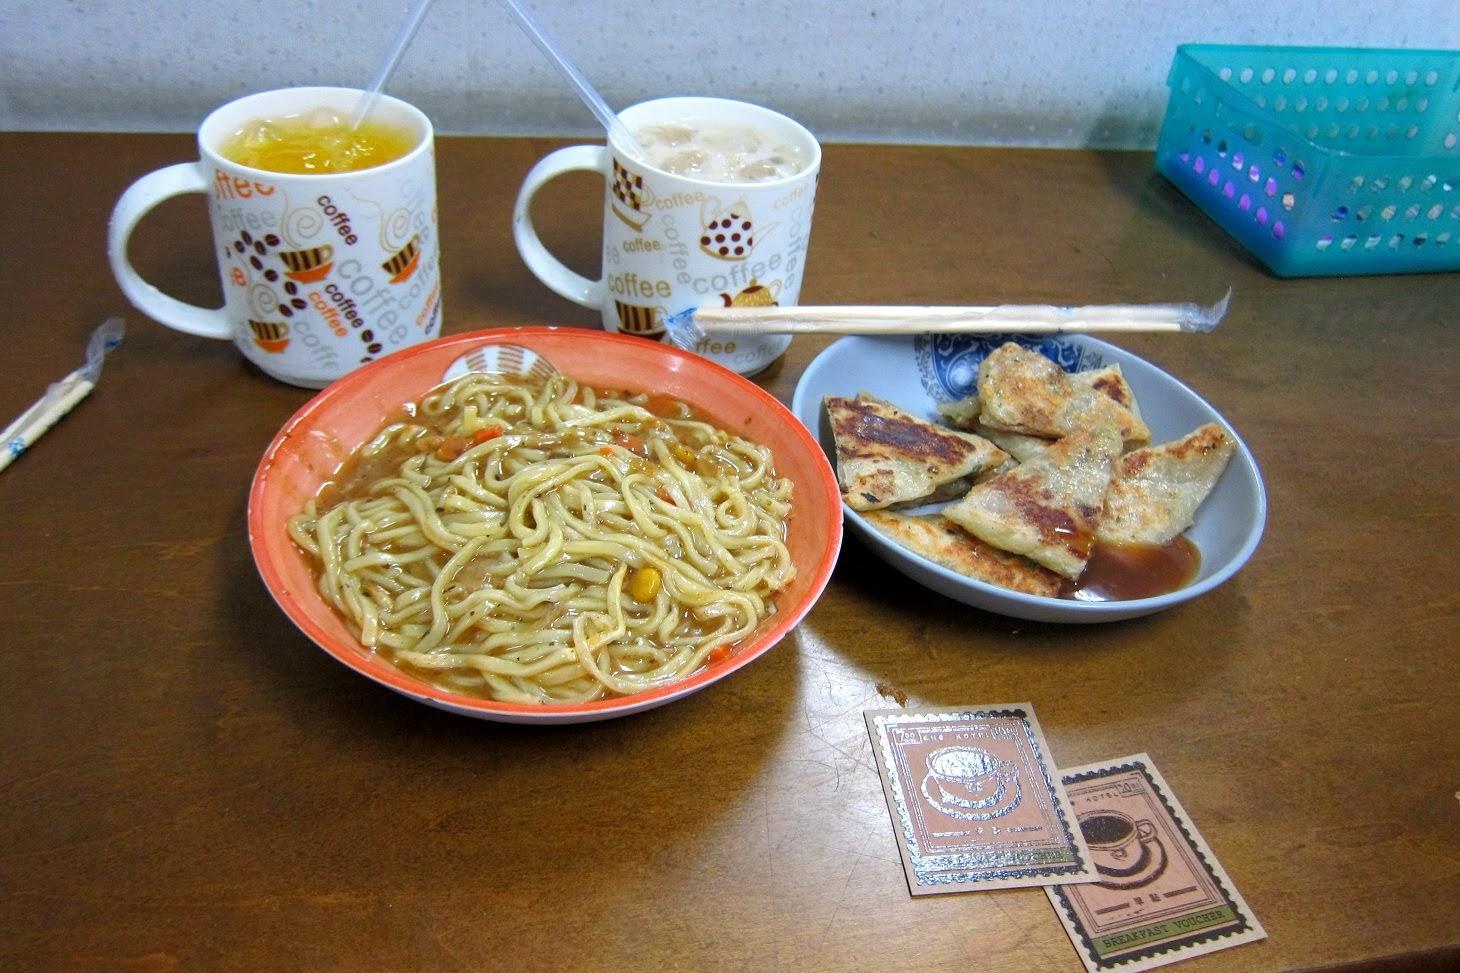 Cho Hotel Ximending breakfast